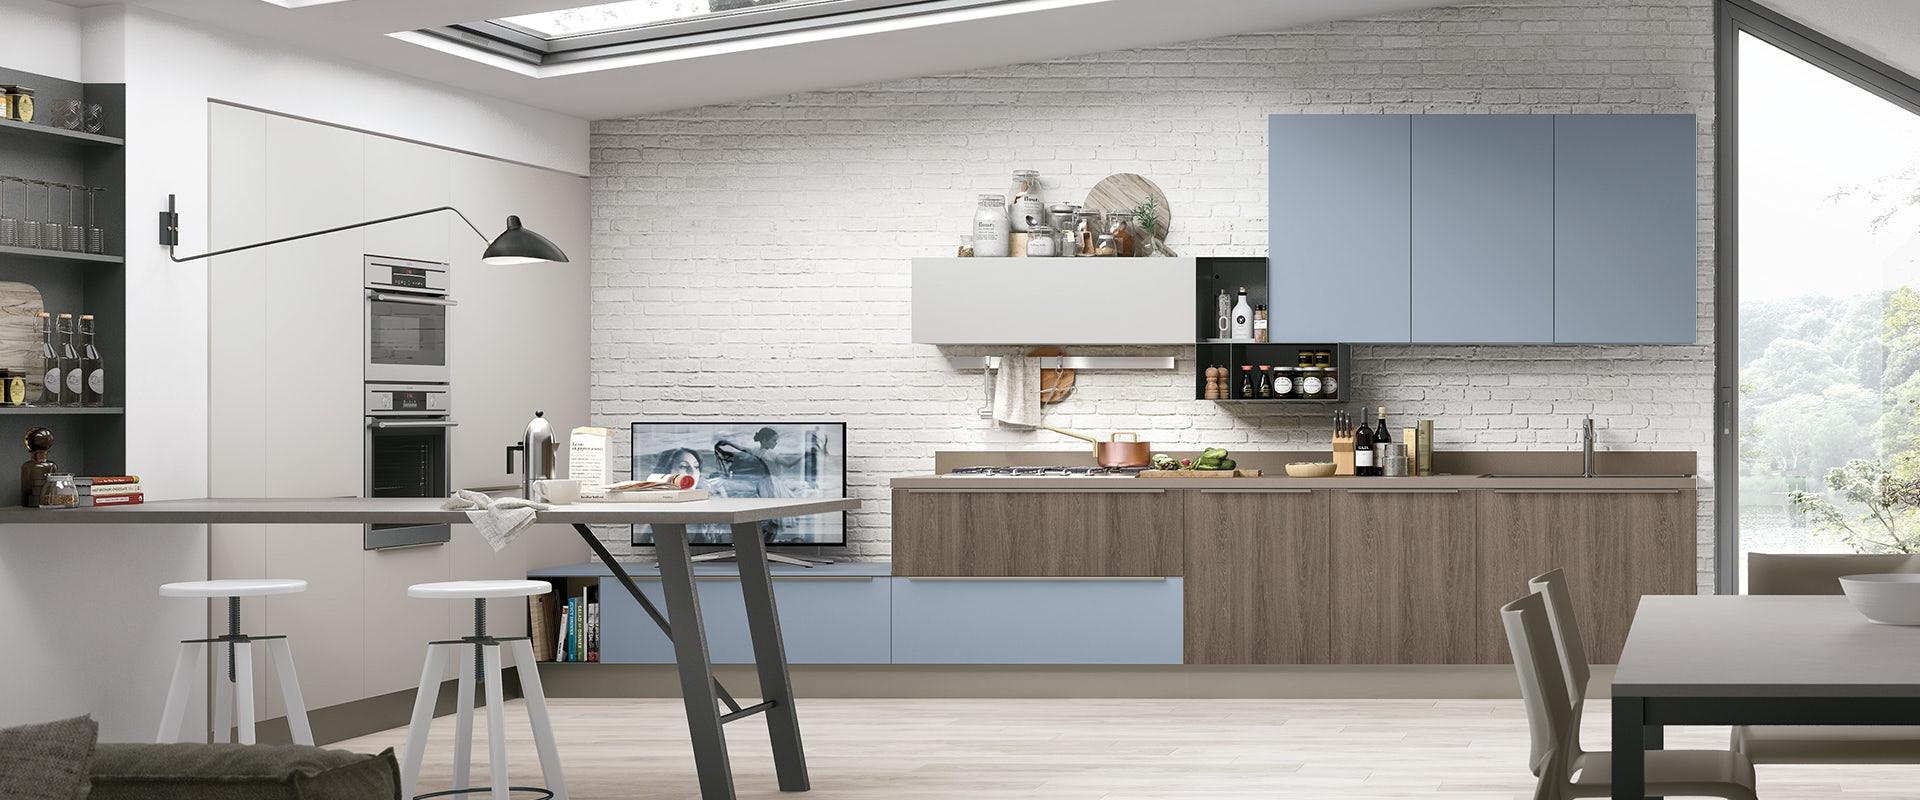 stosa-cucine-moderne-replay-300.jpg